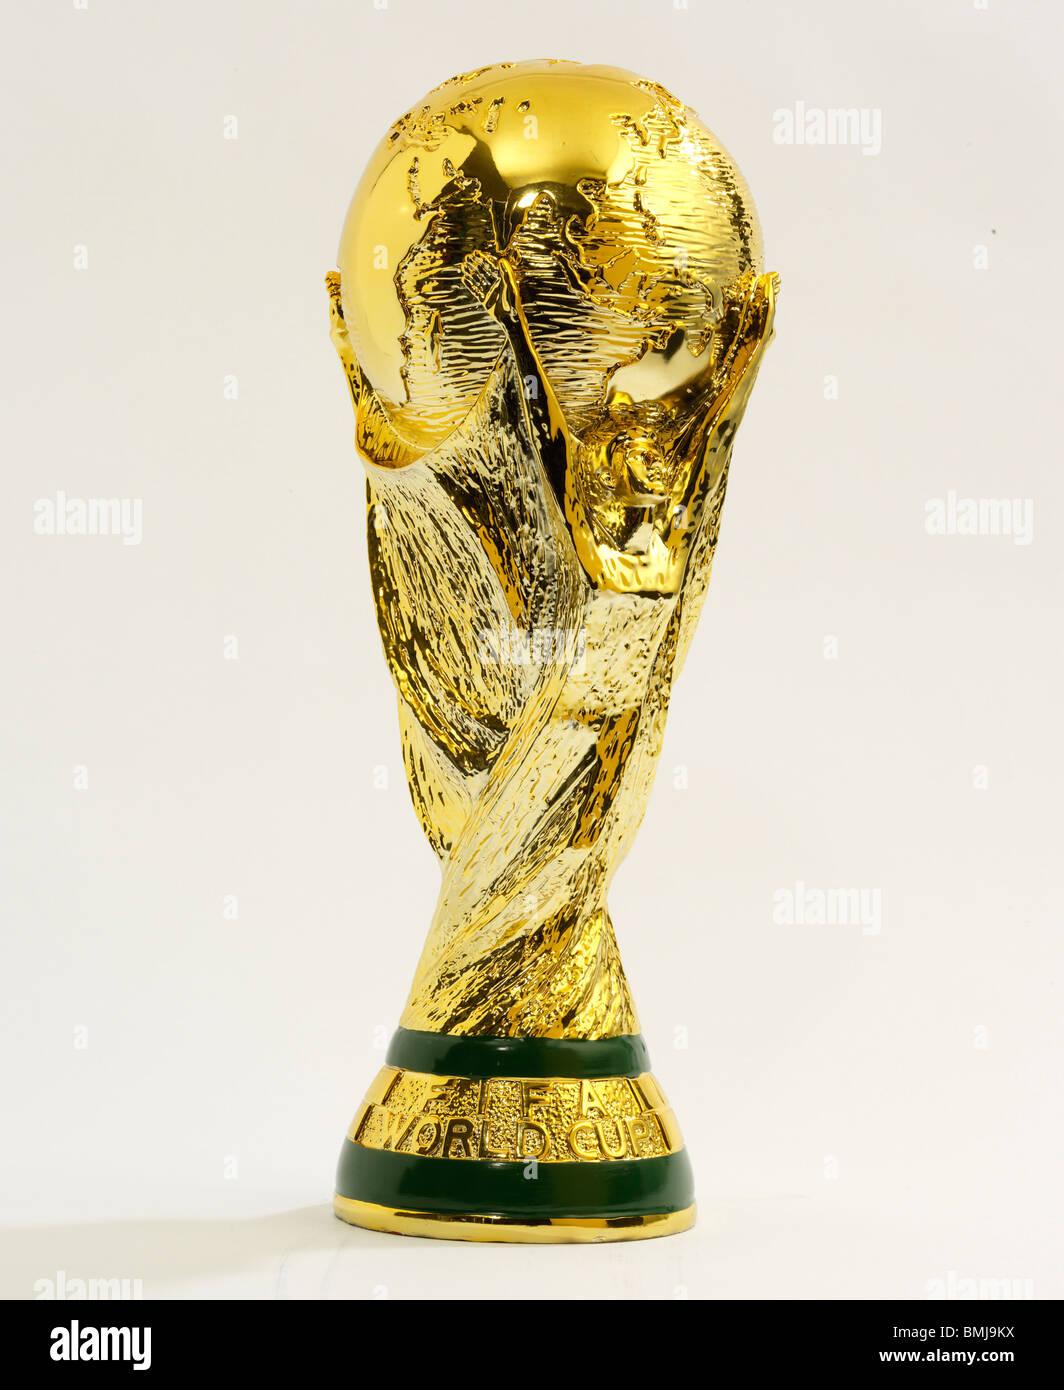 4fe529cf7da Football World Cup Trophy - replica FIFA on a plain background Stock ...